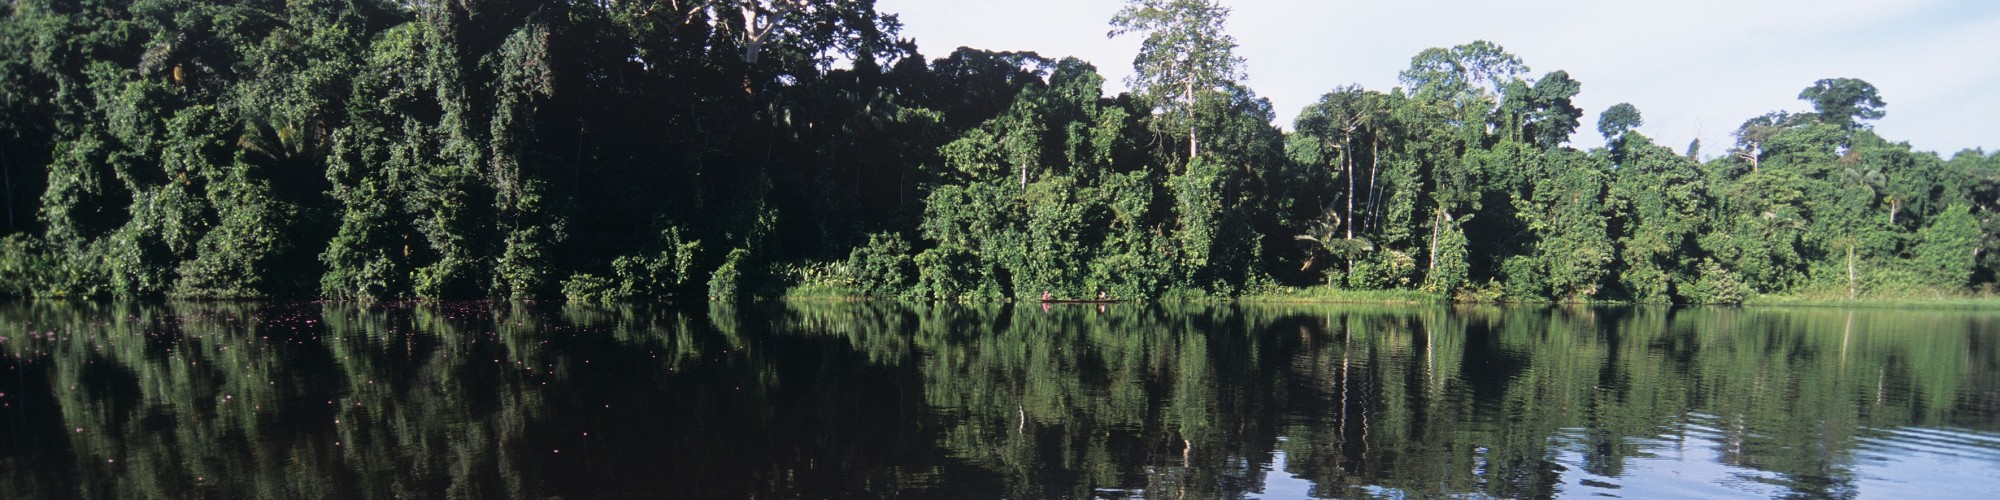 Lake Sandoval, Amazon